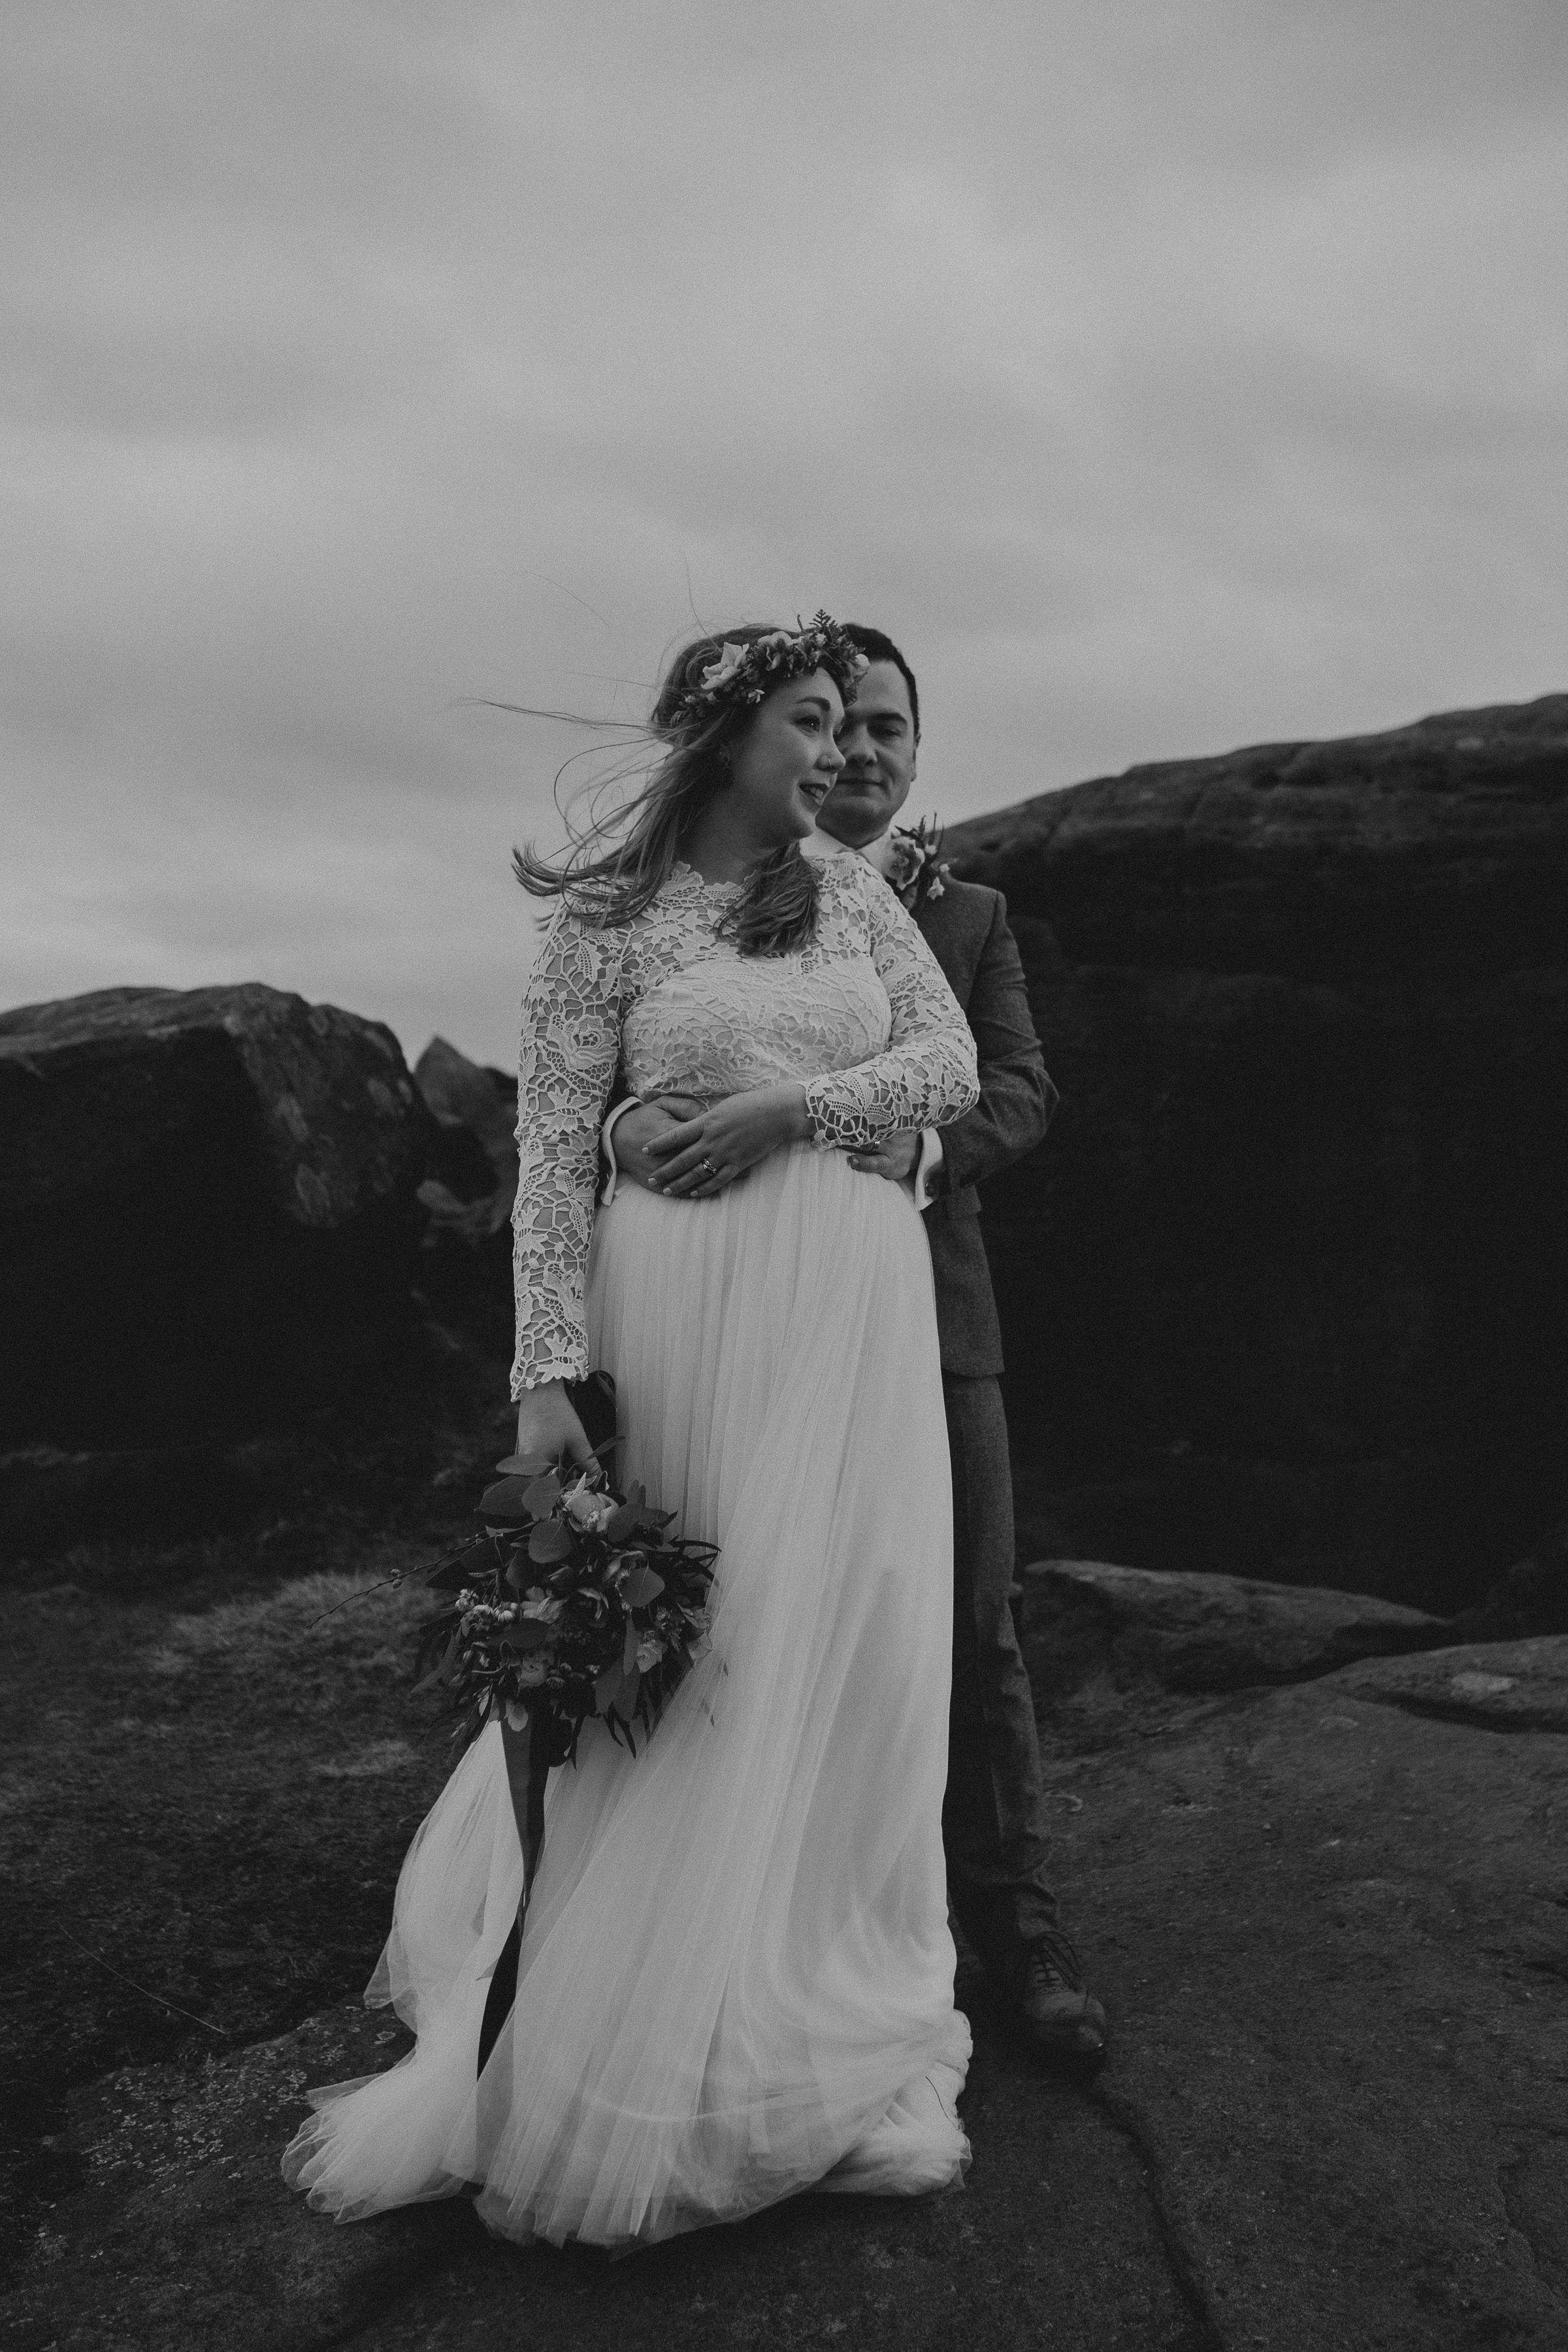 Rosie-bespoke-lace-long sleeved-tulle-wedding-dress-winter-peak district-susanna greening-22.jpg